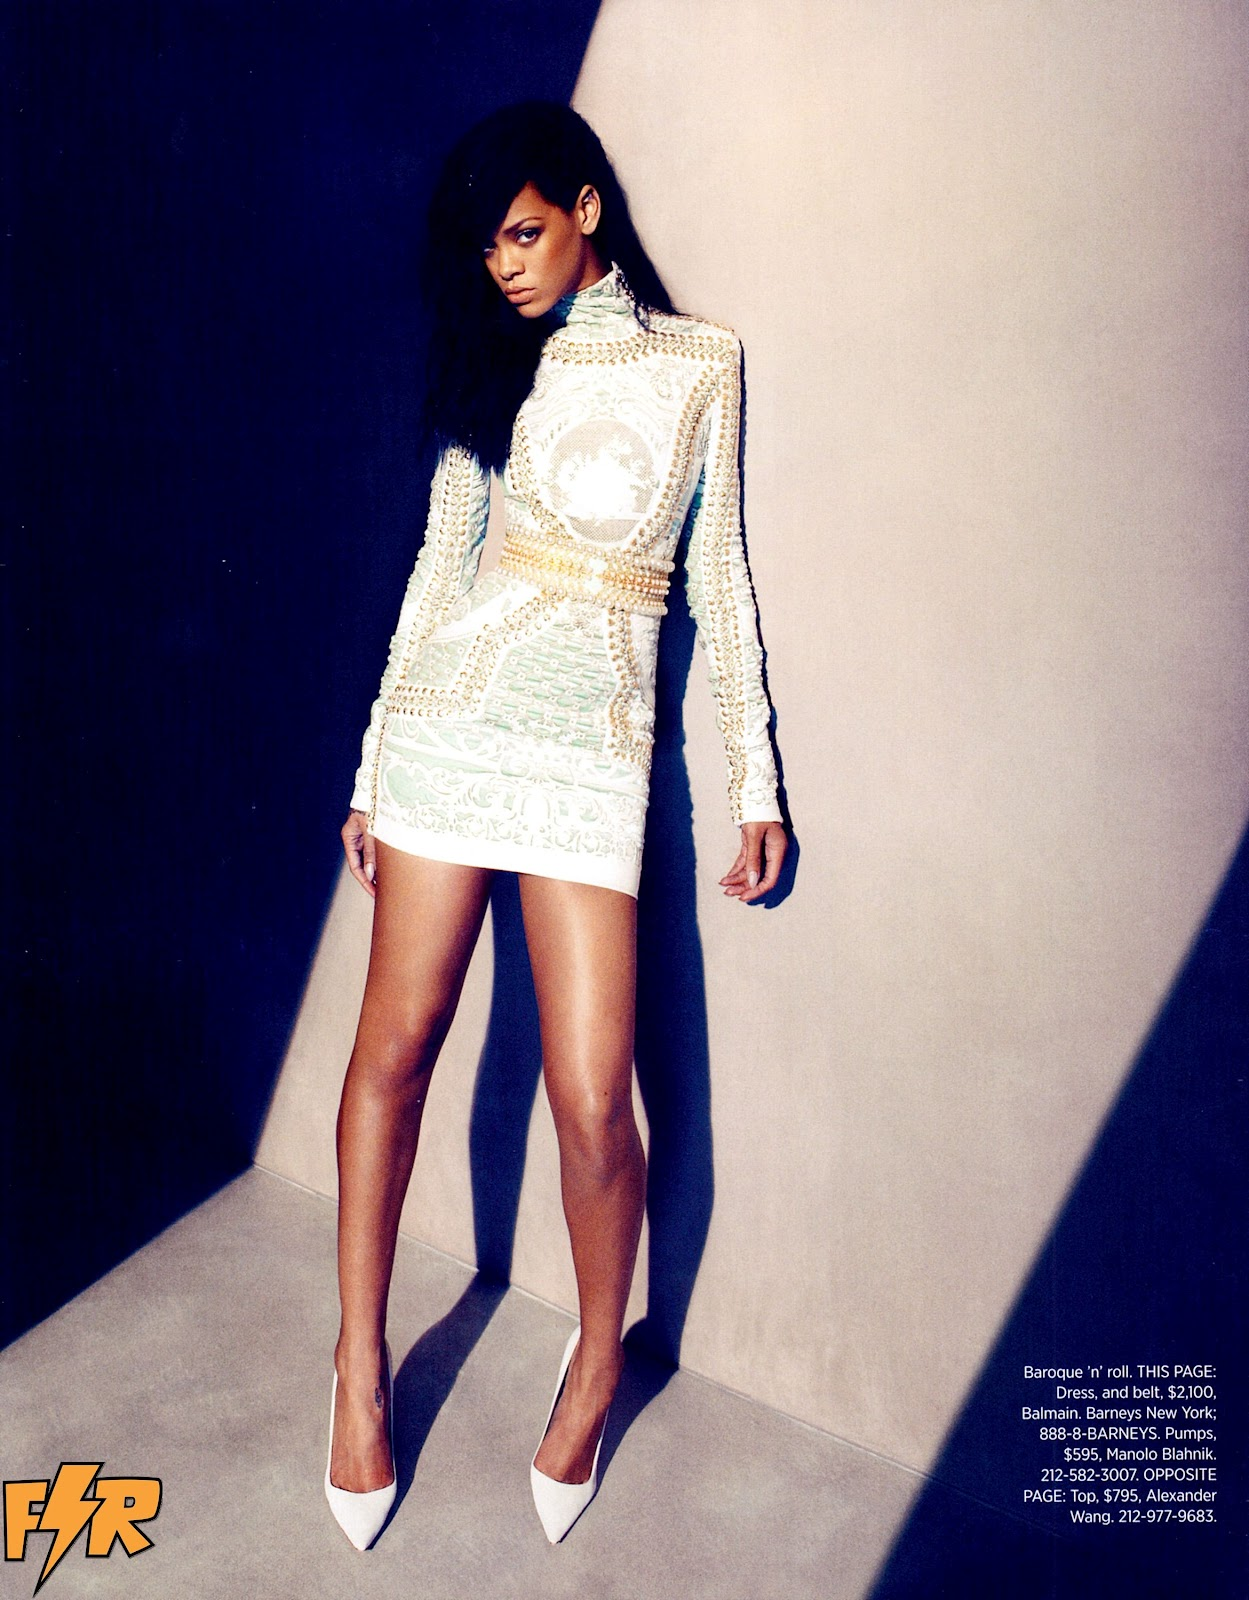 http://2.bp.blogspot.com/-tLwnR94Bbgs/T_gSKj8lwbI/AAAAAAAAKFY/2h6mjD2DVBo/s1600/Rihanna++Covers+Harper%27s+Bazaar+Magazine+August+2012+Issue+-05.jpg